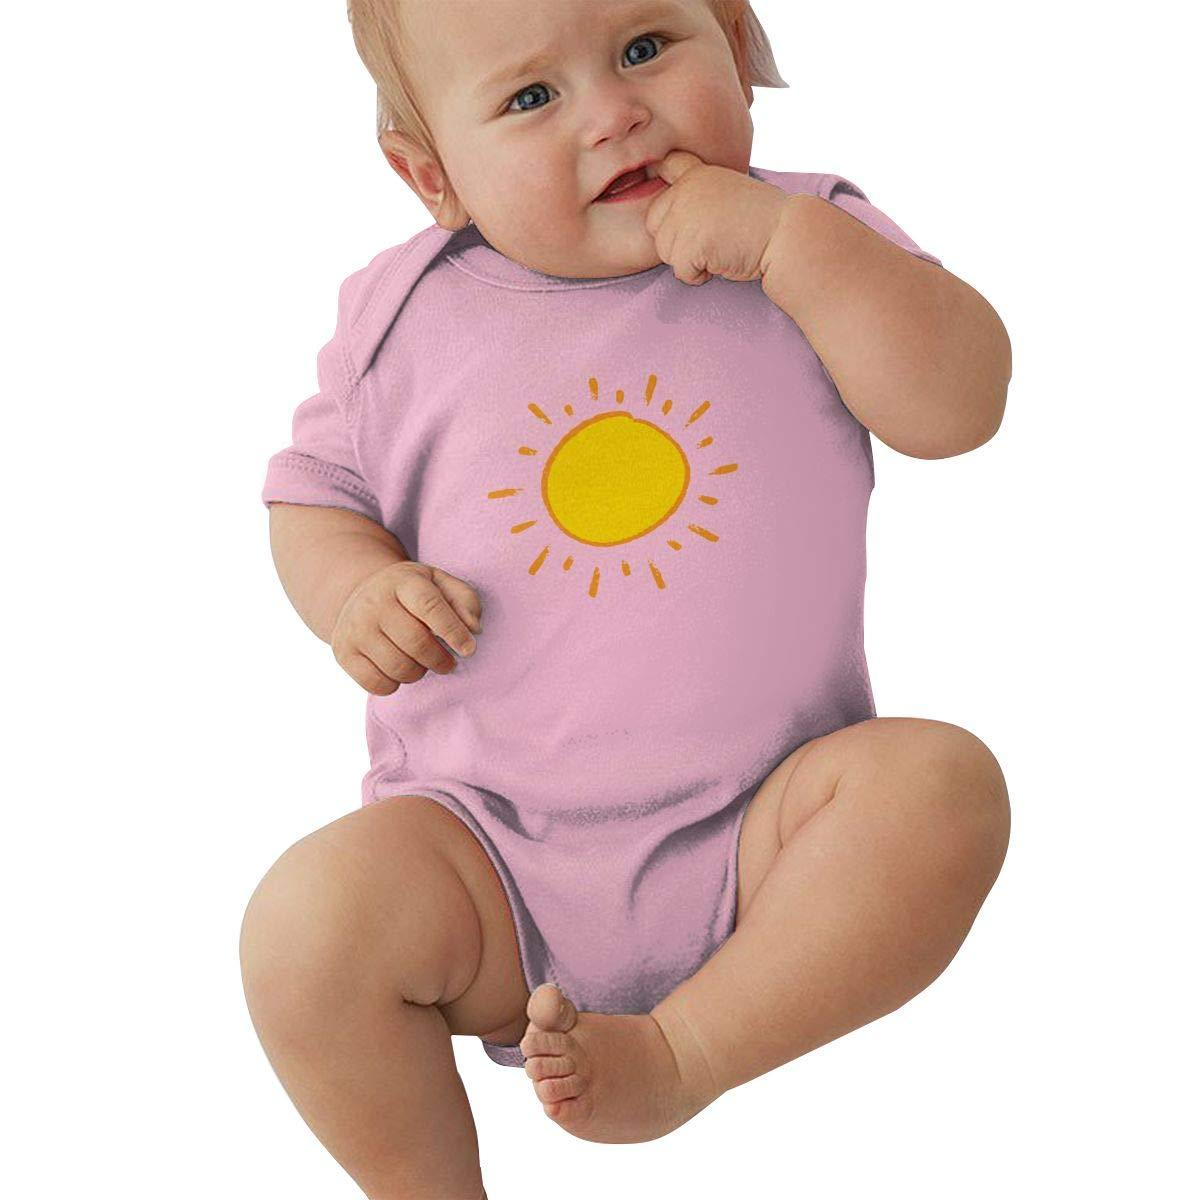 Dfenere Sunshine Retro Newborn Baby Short Sleeve Bodysuit Romper Infant Summer Clothing Black